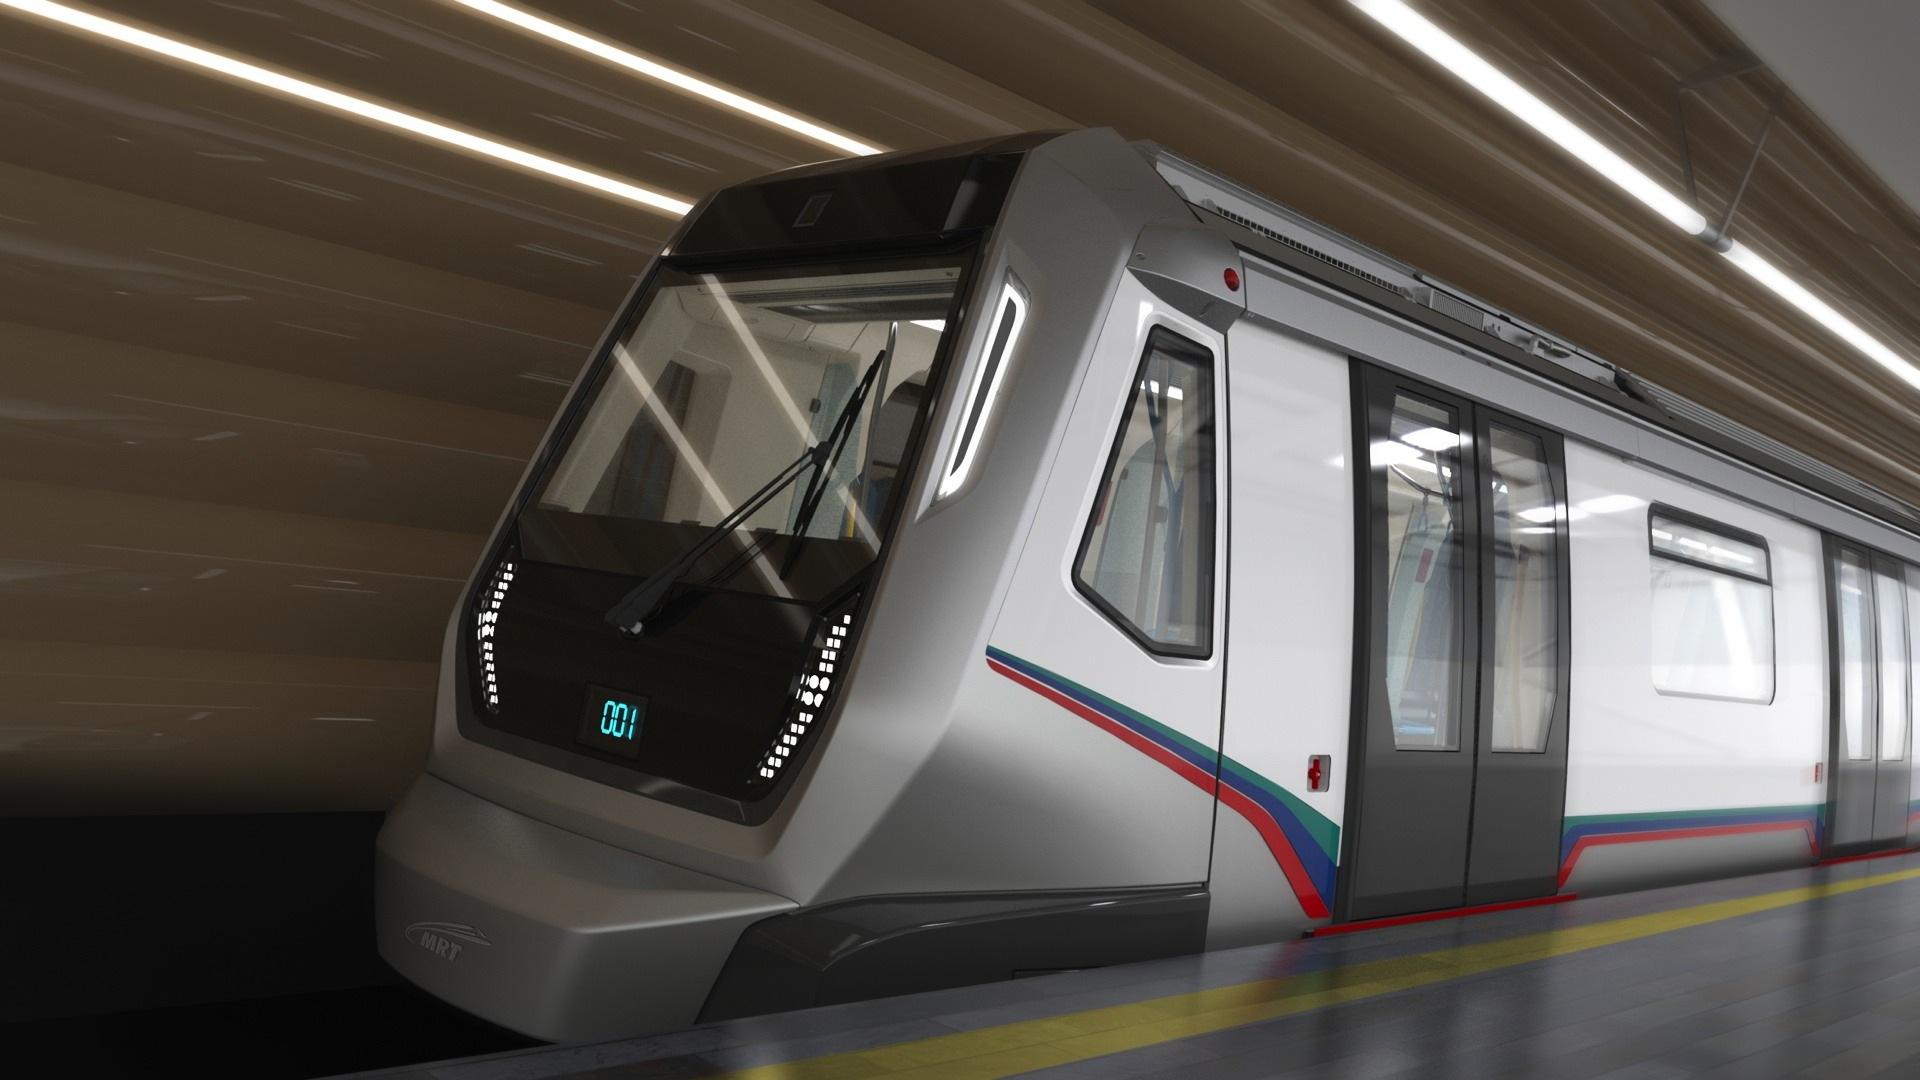 New Century BMW >> Malaysia to Get BMW-Designed Metro Trains - autoevolution